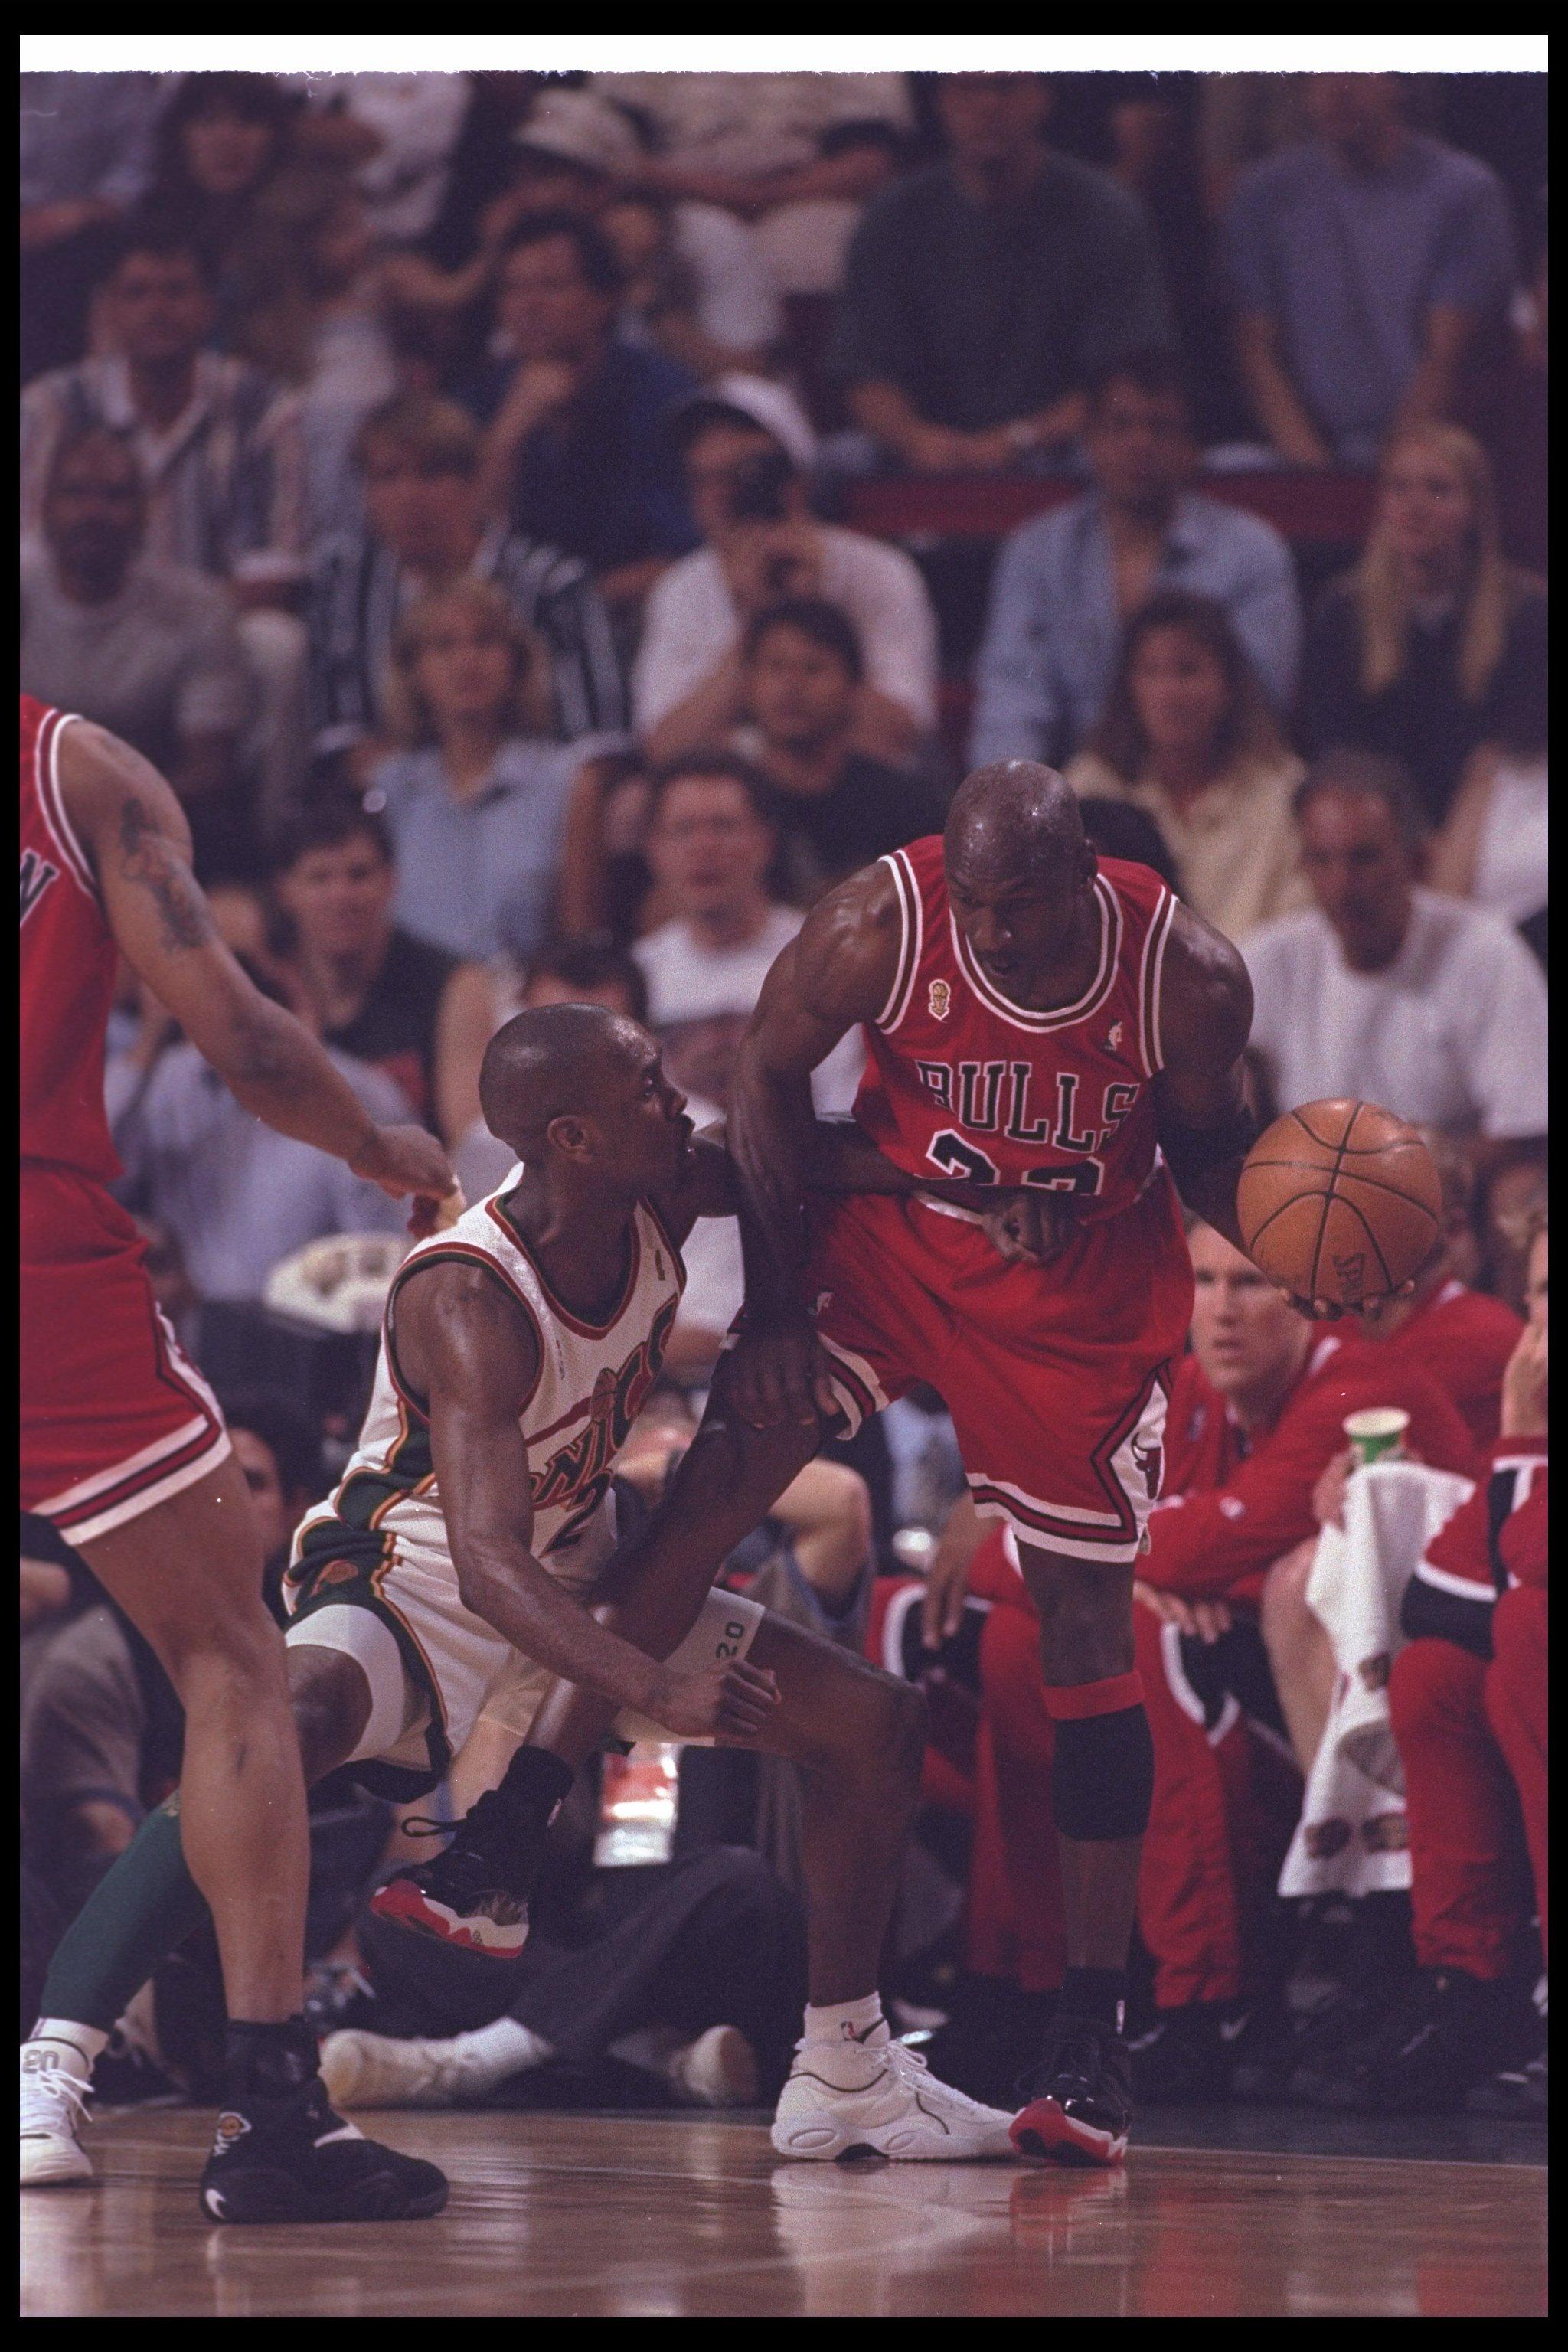 This guy dressed exactly like '90s-era Michael Jordan for ...